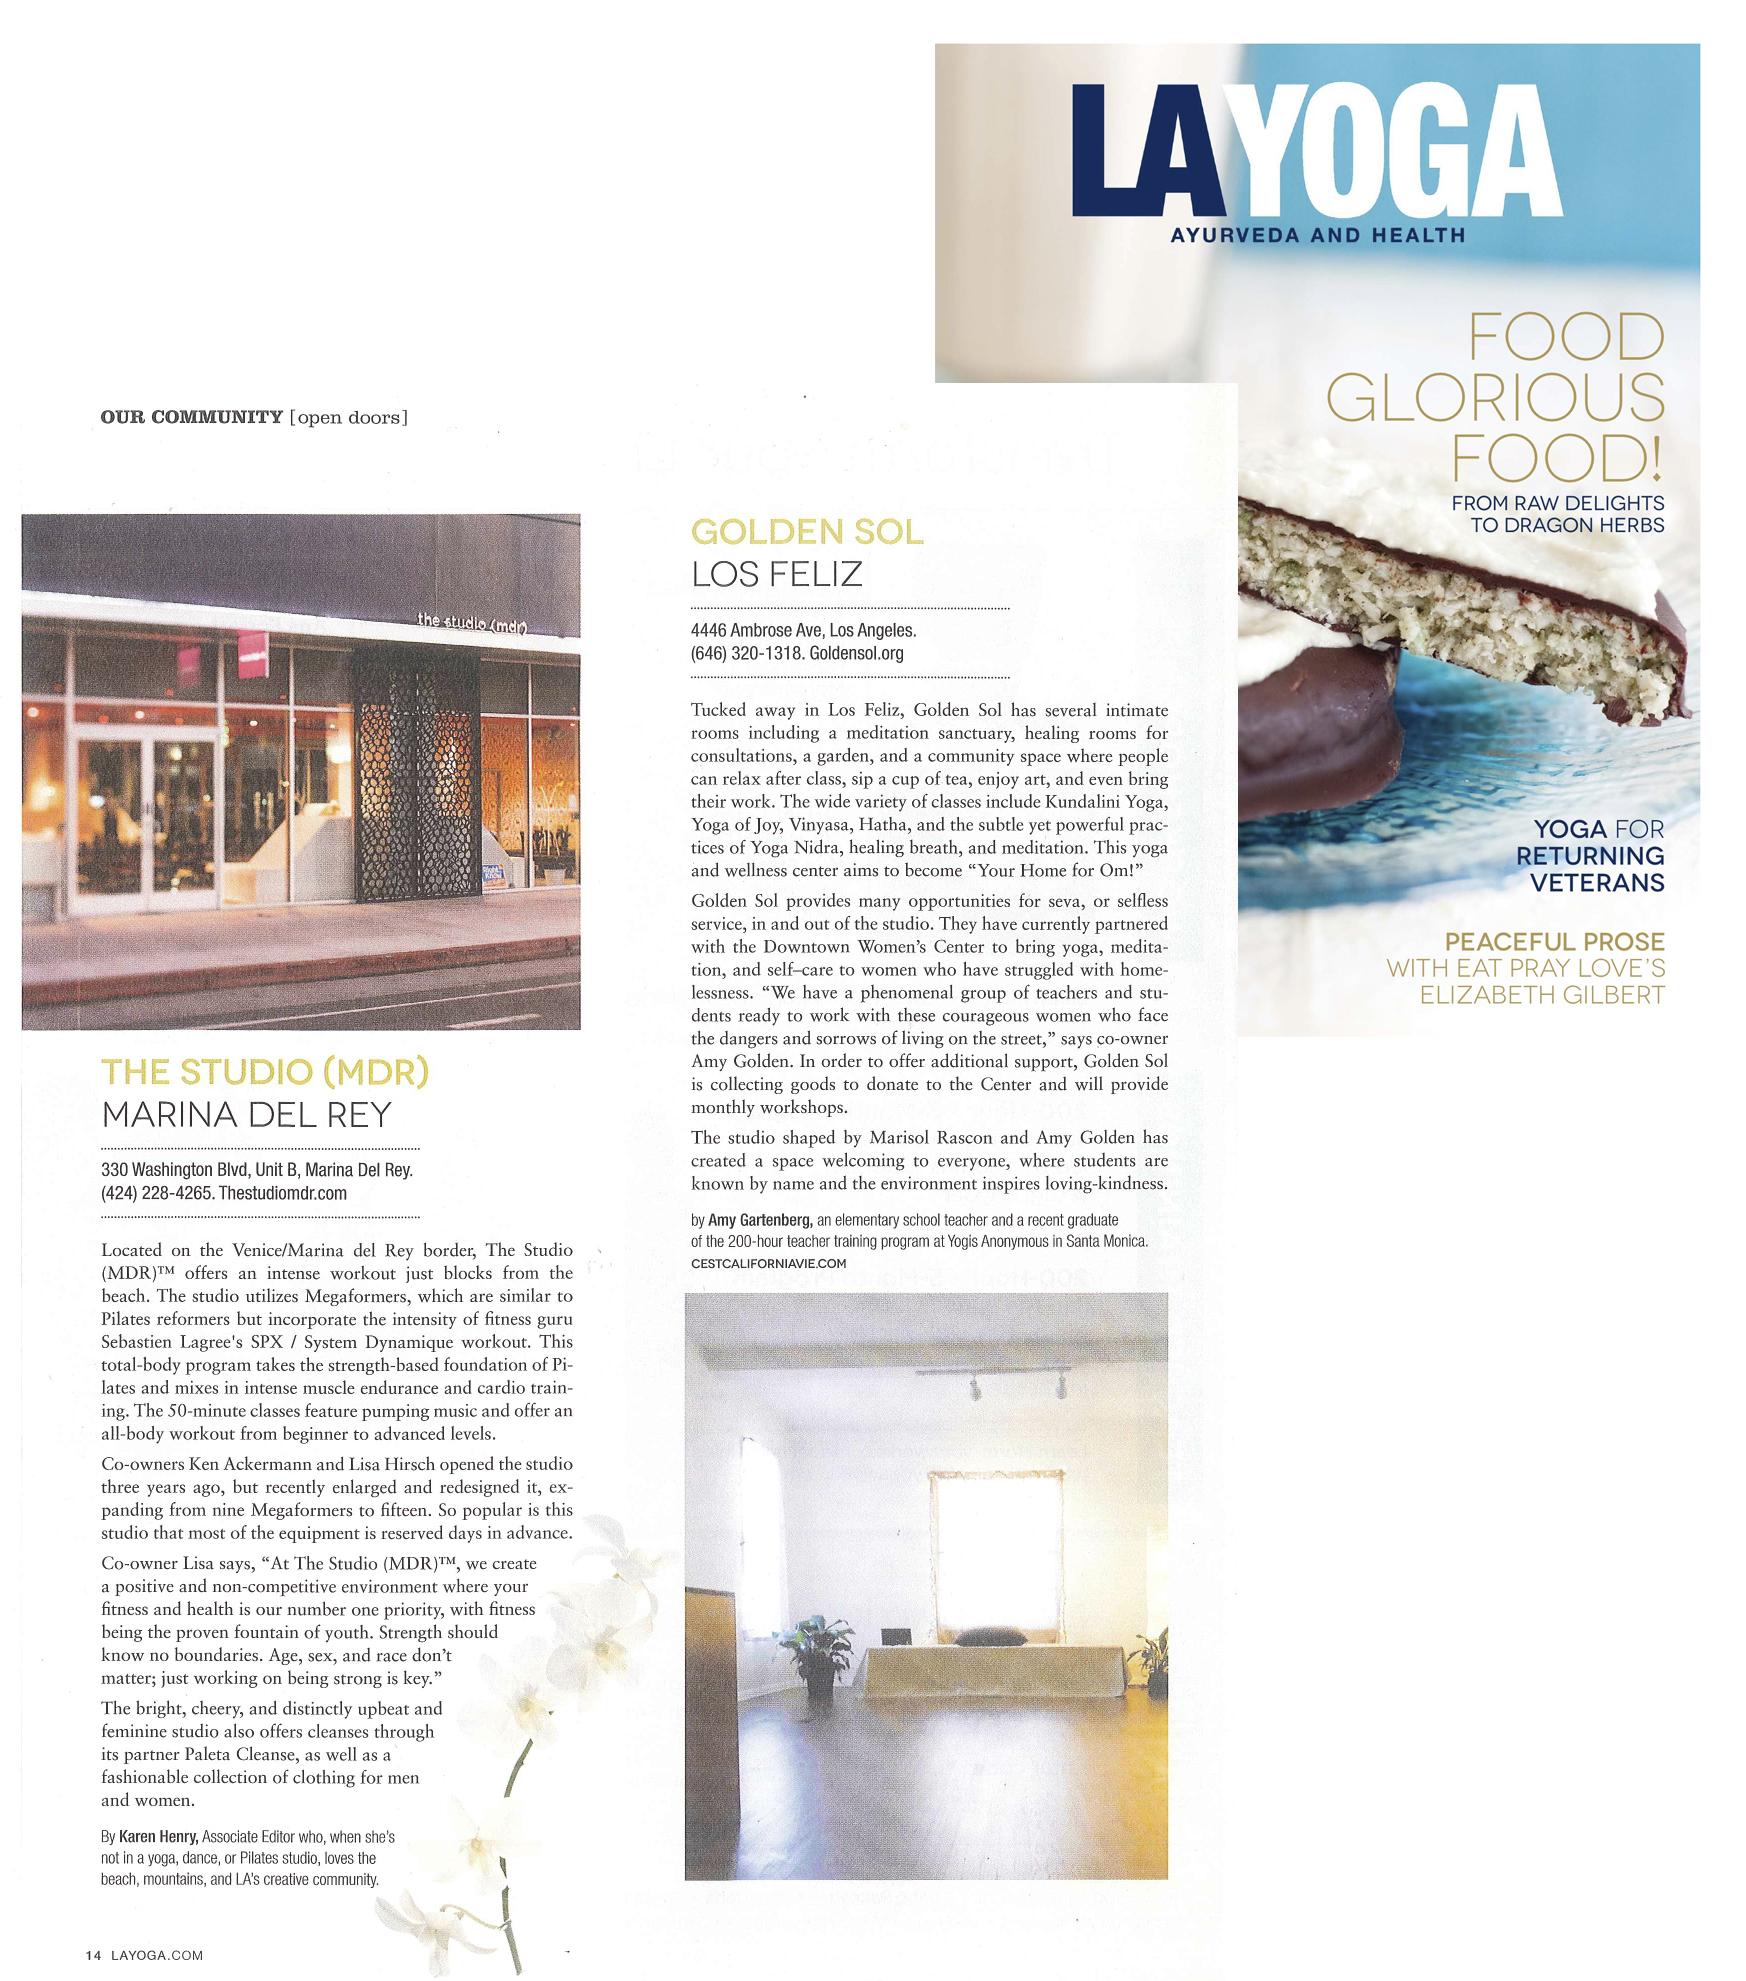 LA Yoga article